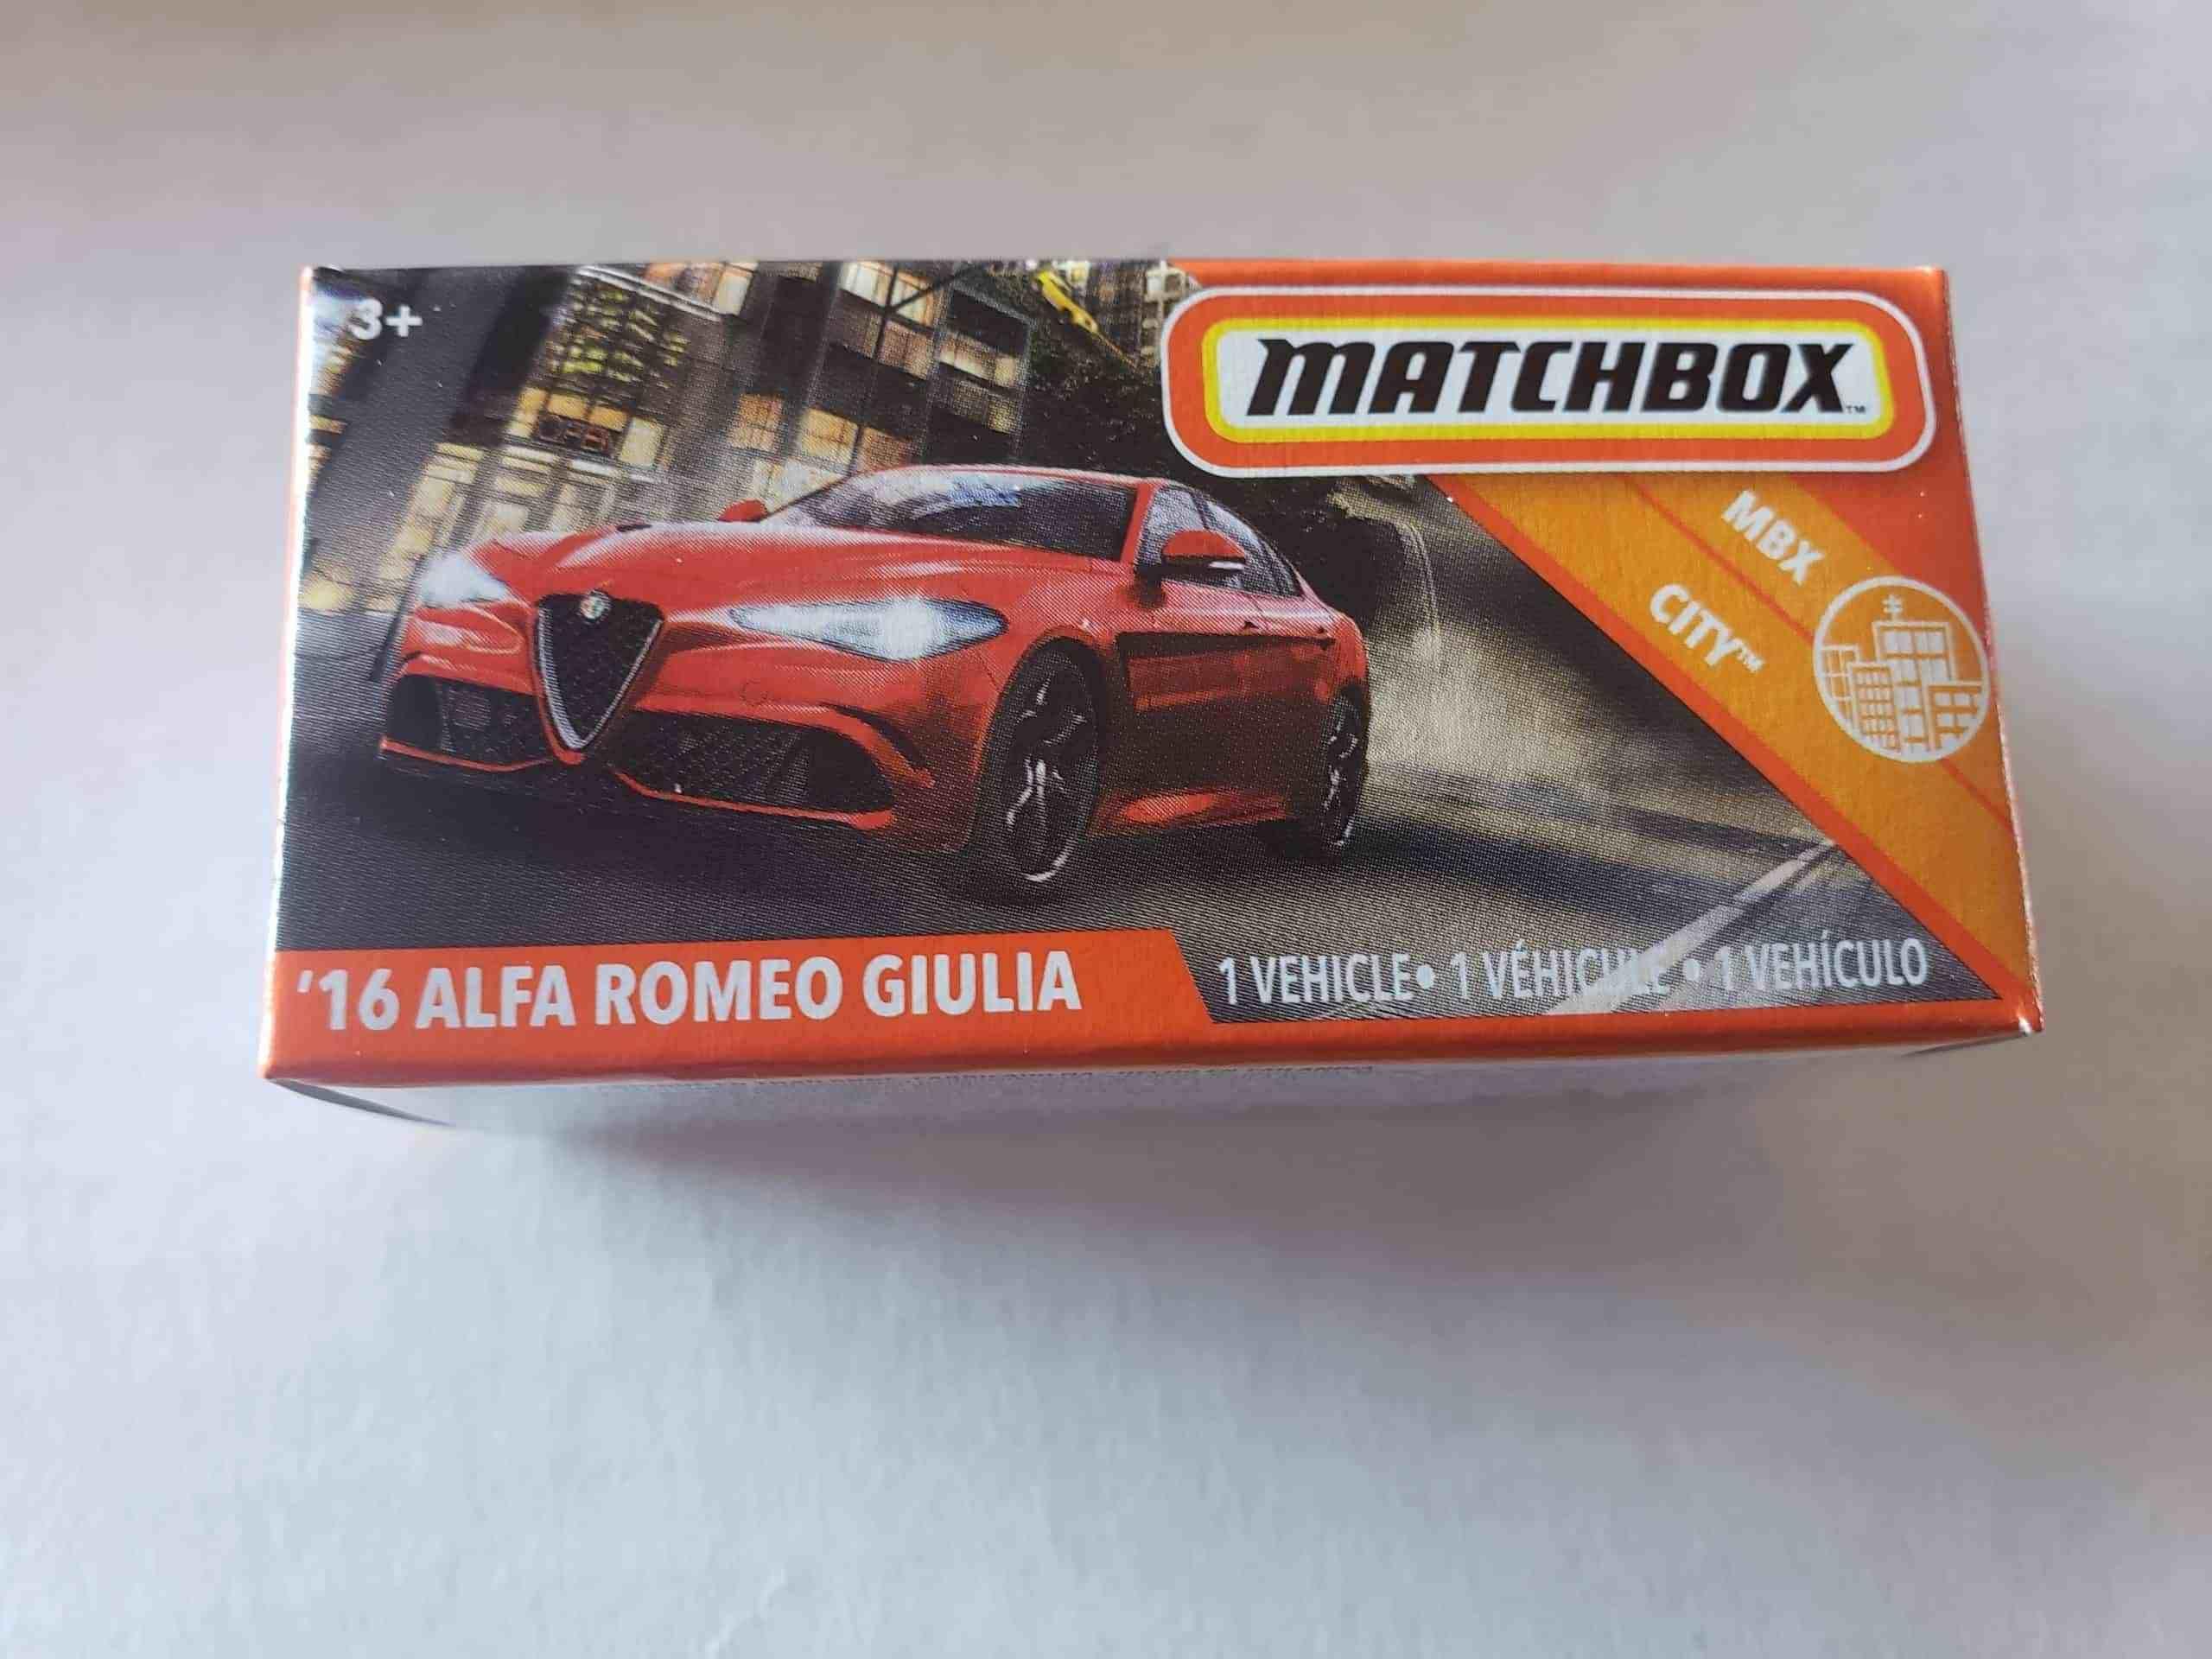 Matchbox 2020 Mbx City 2016 Alfa Romeo Giulia Power Grabs Gkn25 At Jtc Collectibles Alfa Romeo Giulia Alfa Romeo Matchbox